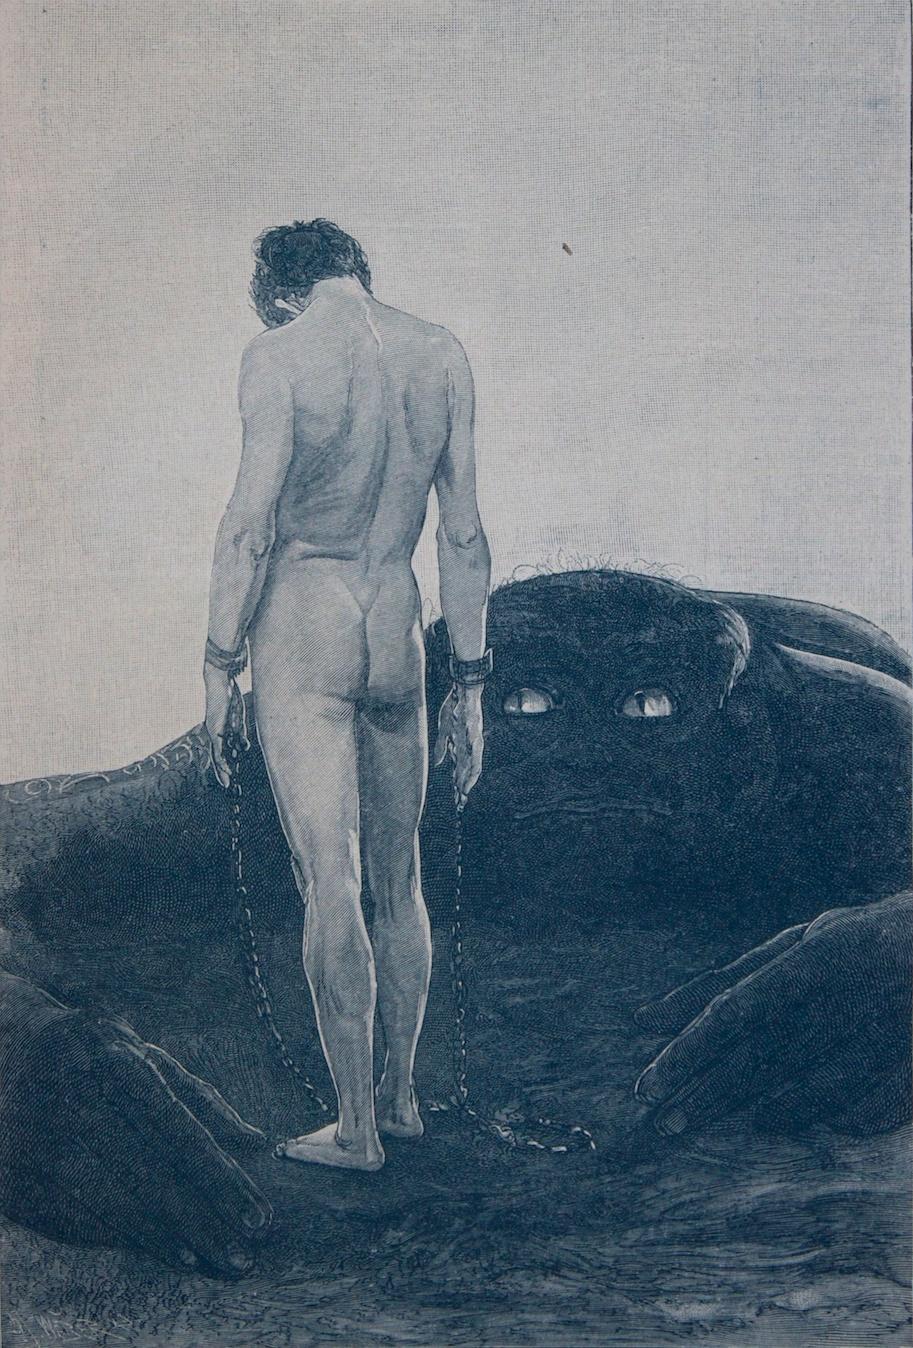 Sascha Schneider - A Feeling of Dependence, 1920 (version 2)